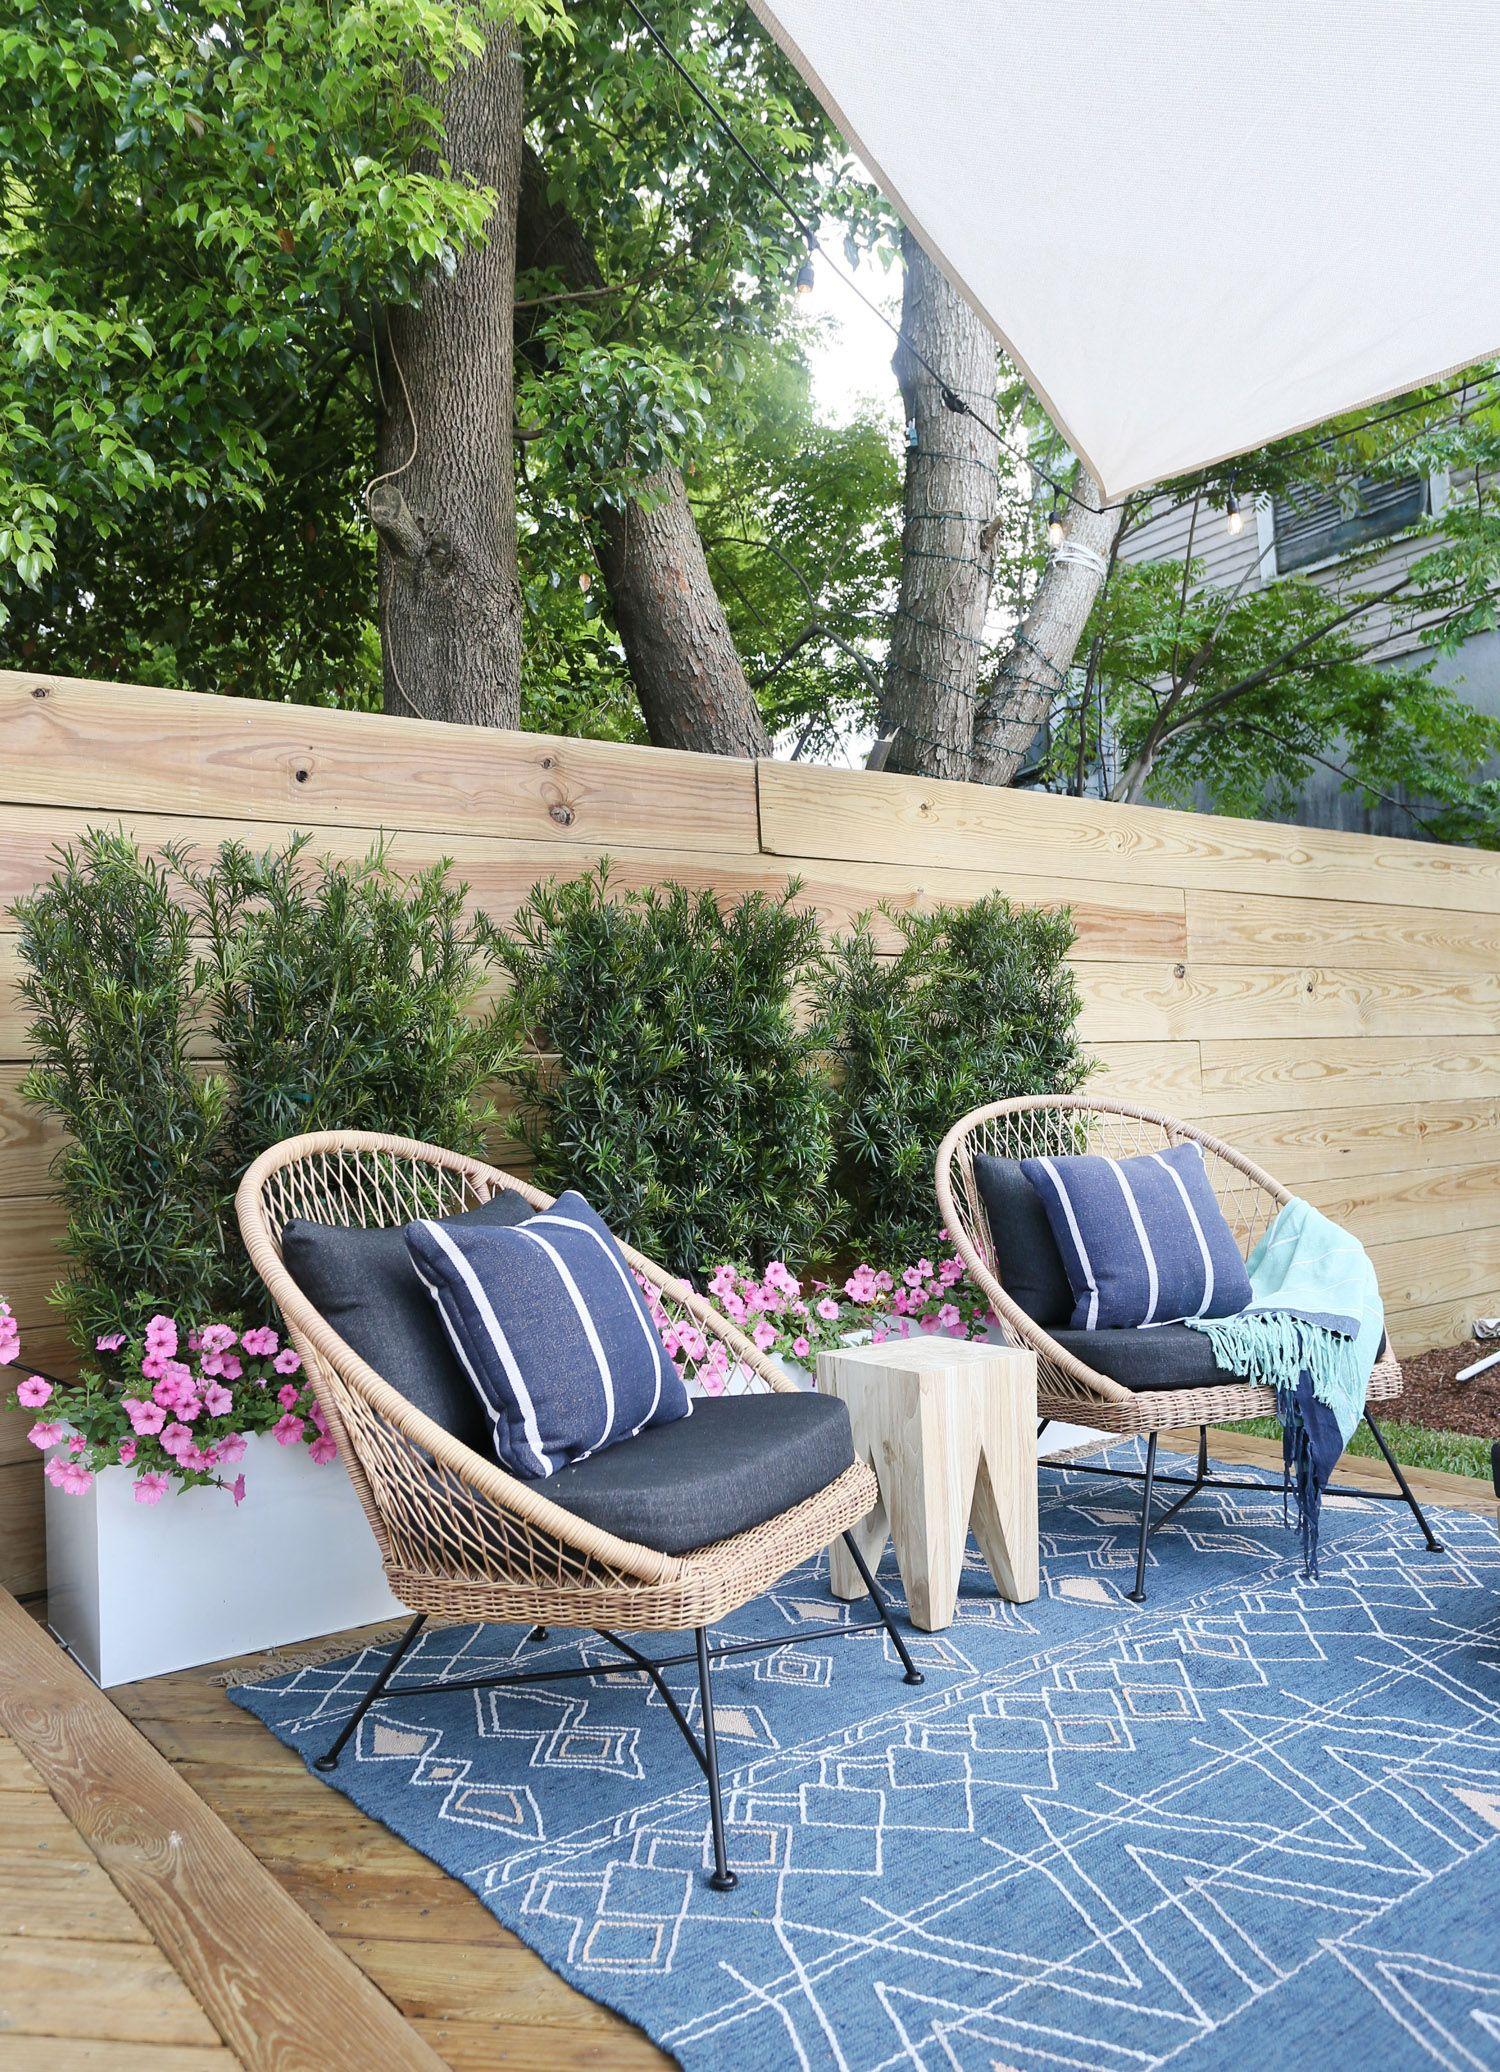 Download Wallpaper Patio Furniture Repair Prescott Az